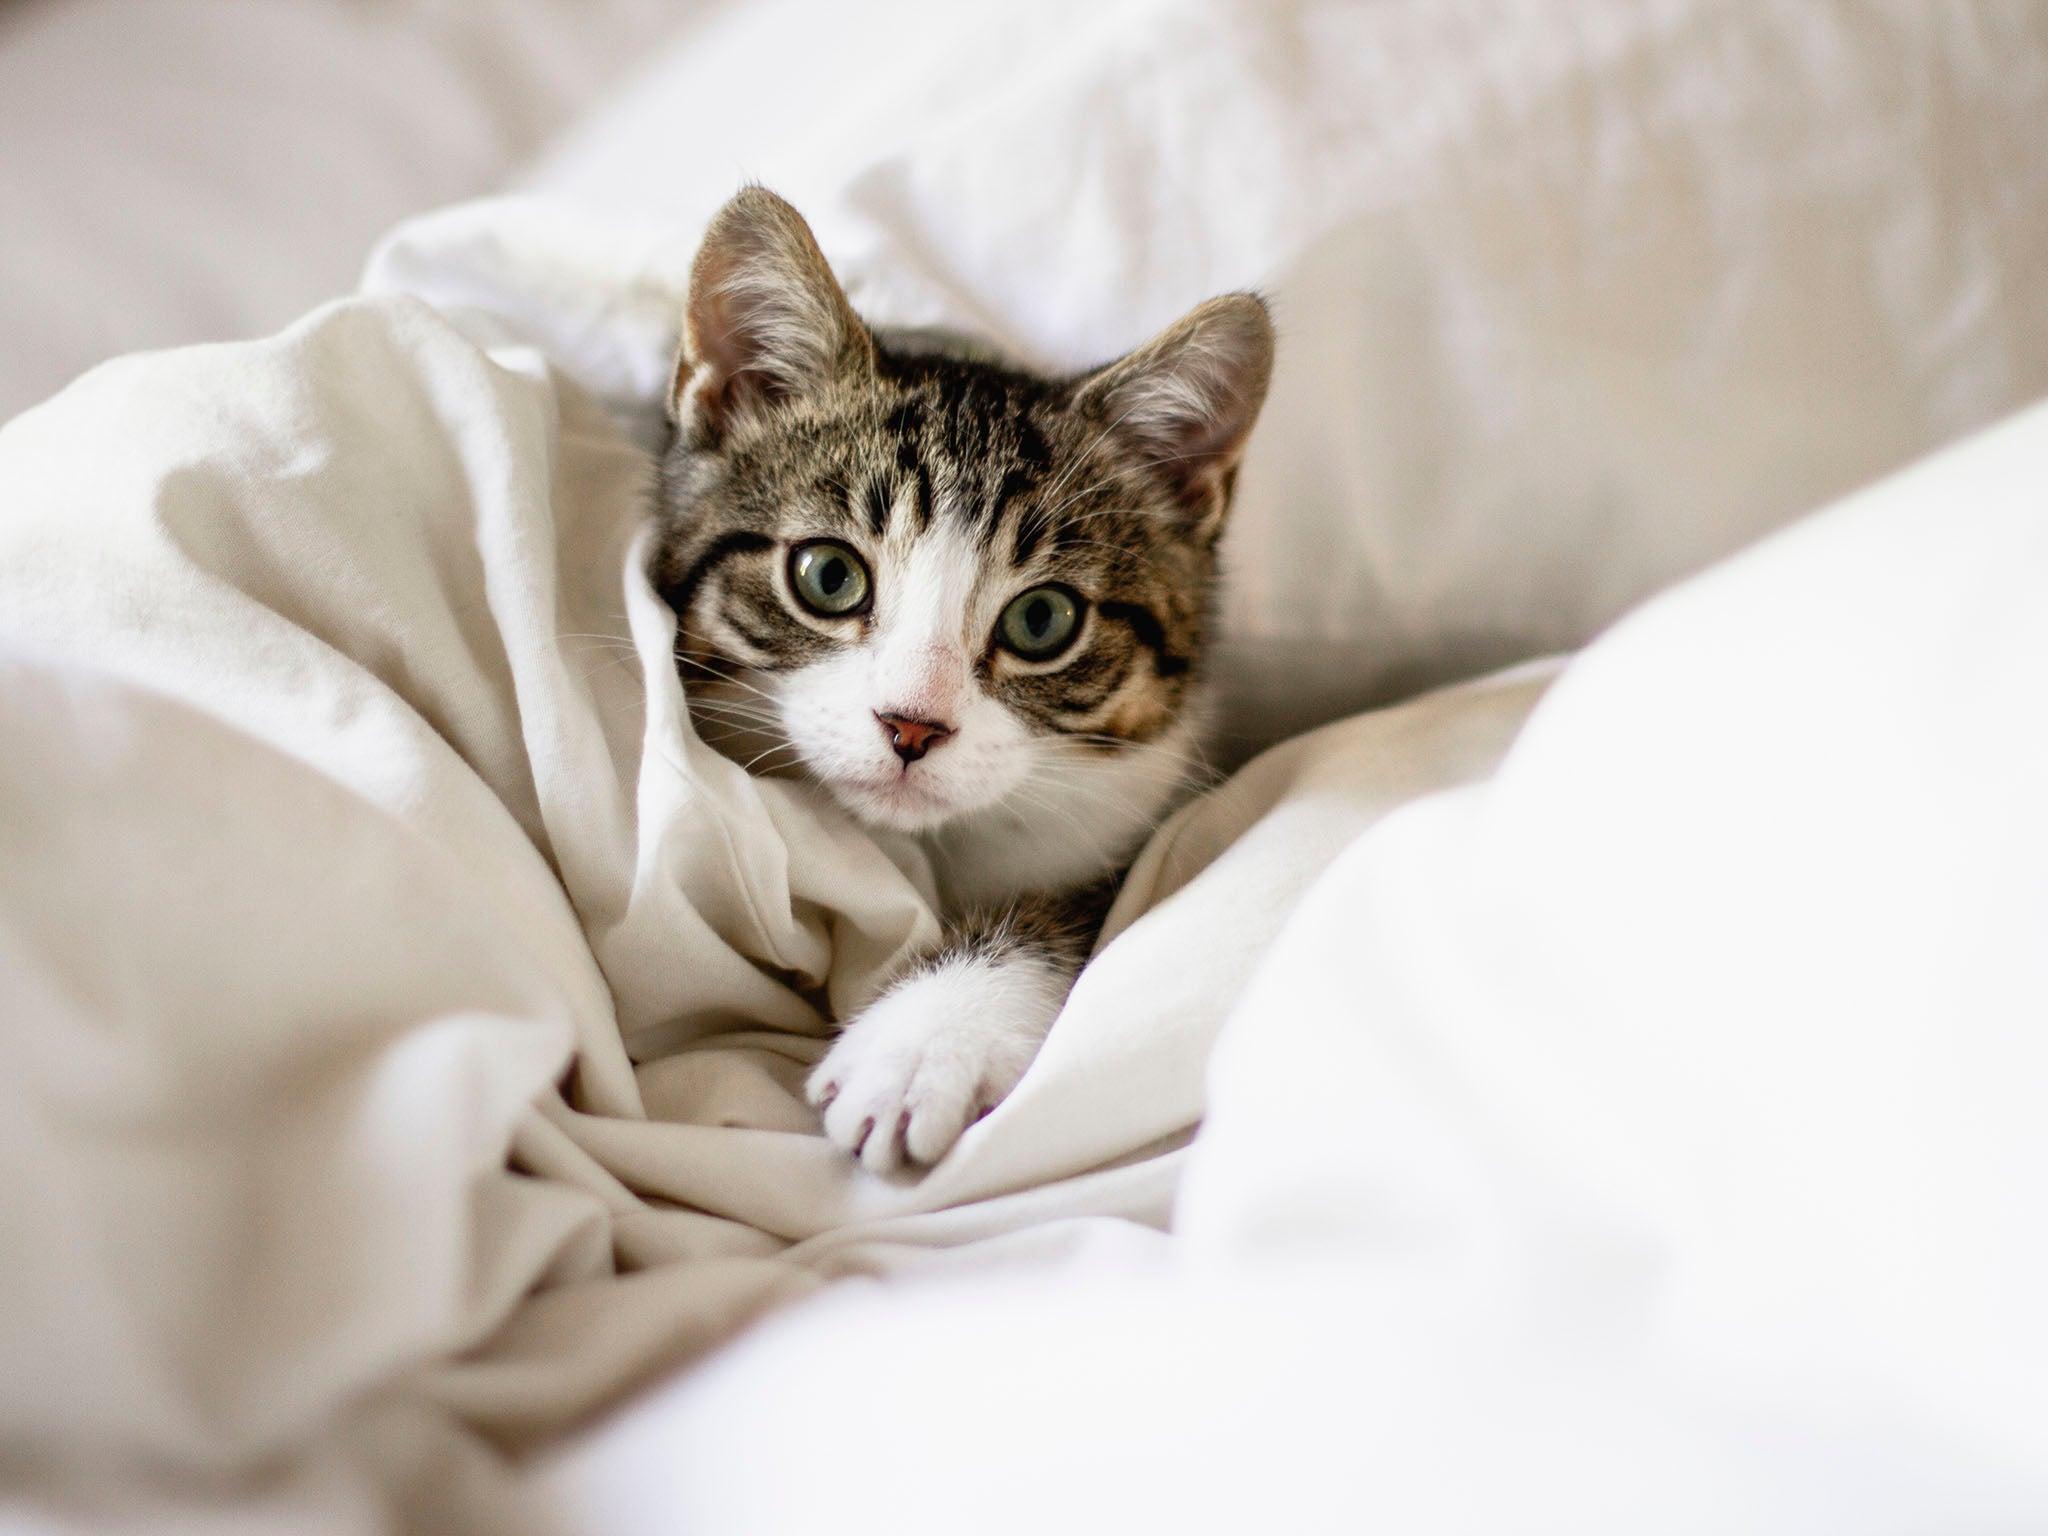 Feline fine: How to keep your indoor cat happy, according to scientists